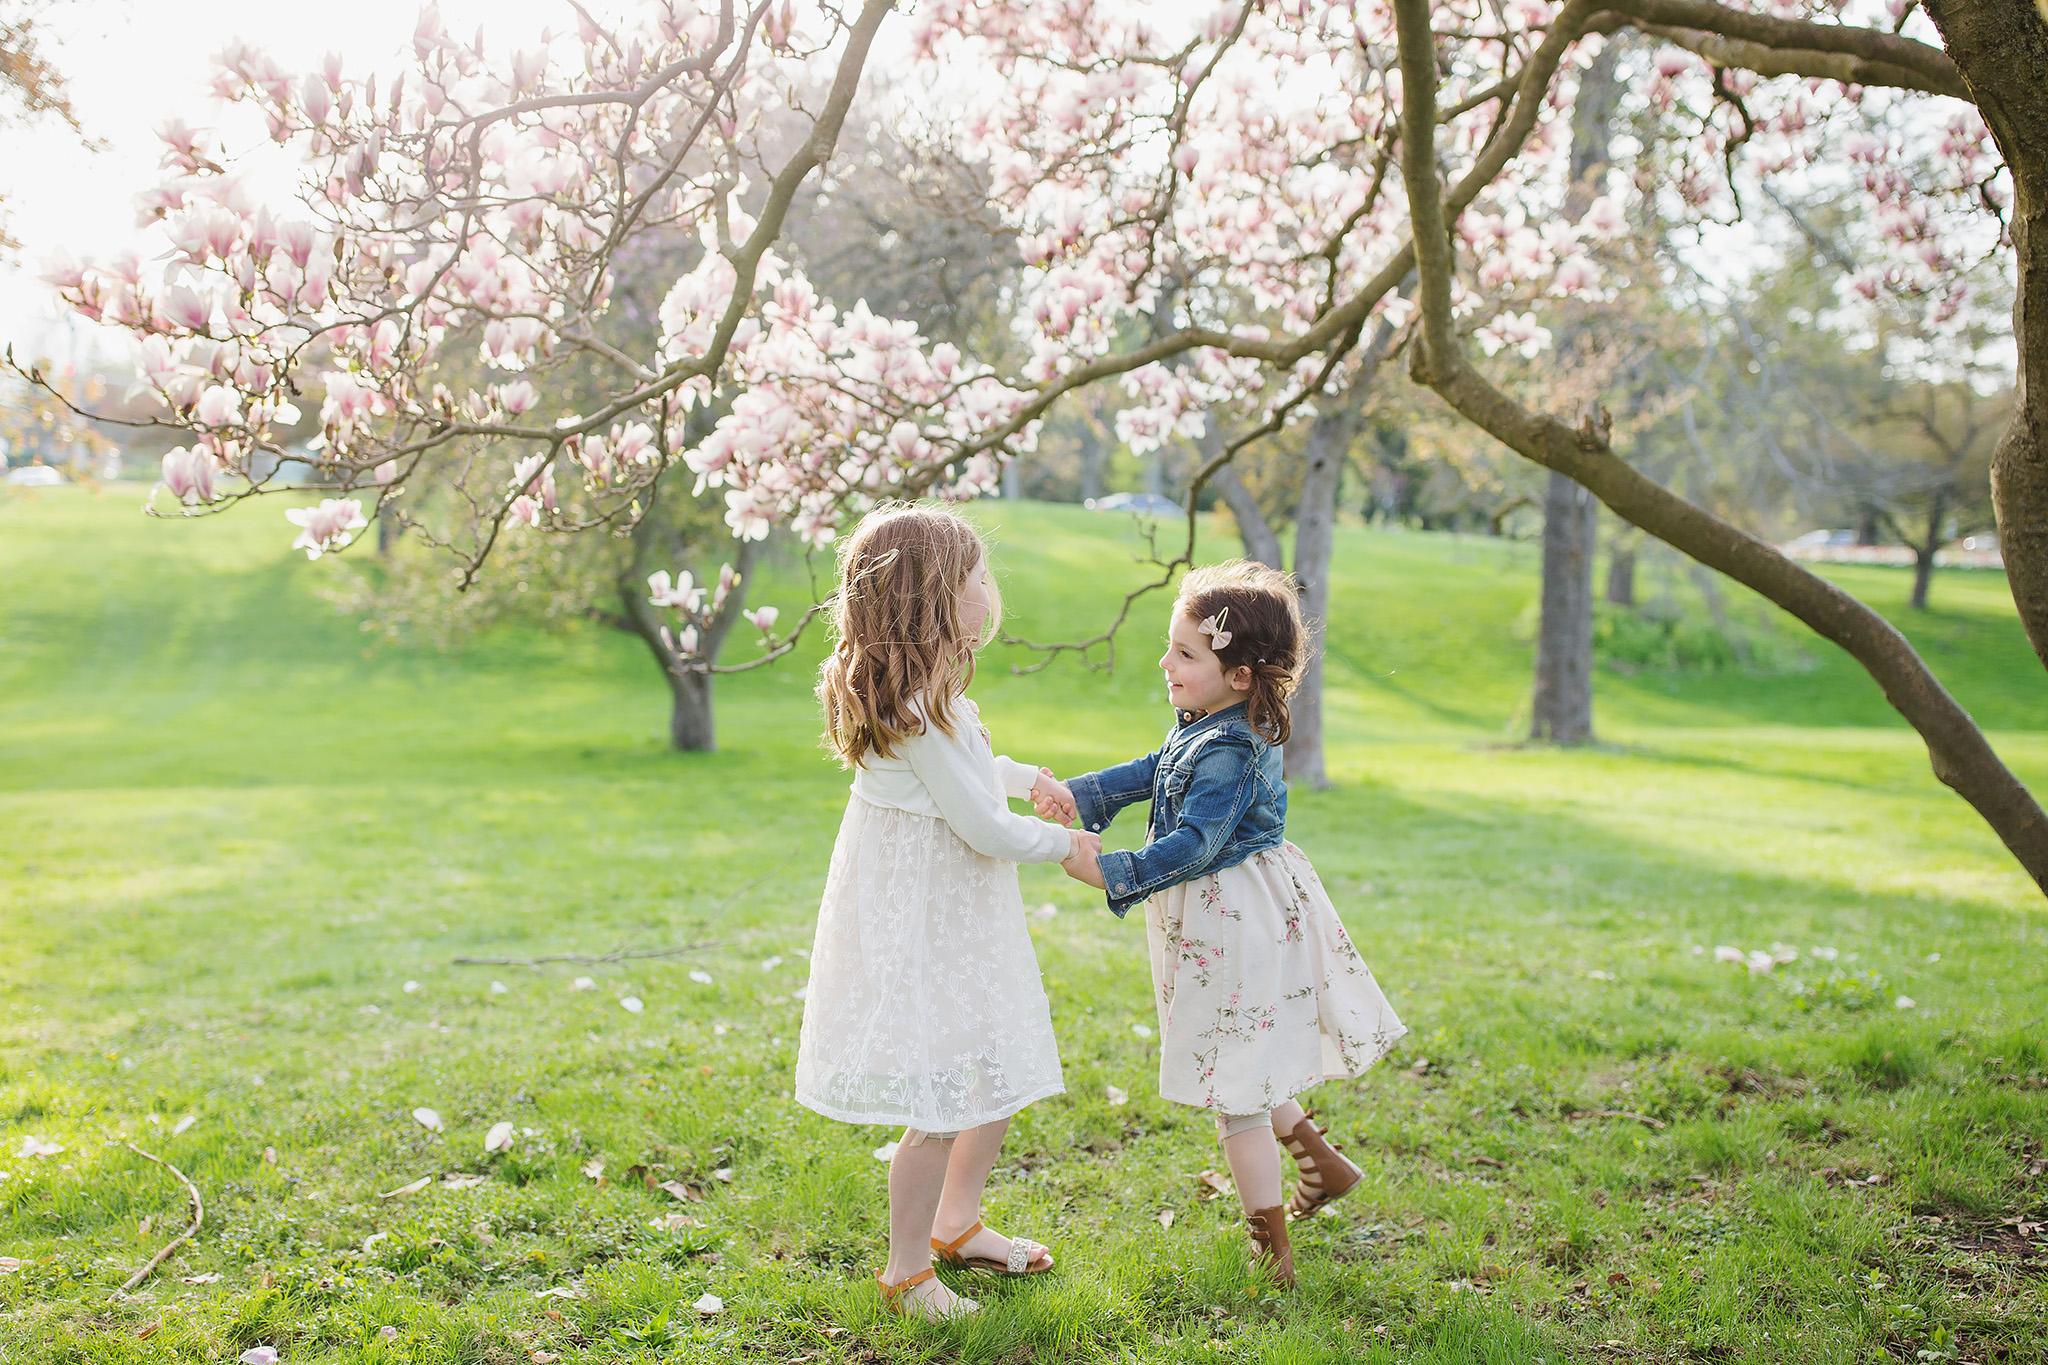 london_ontario_family_photographer-raw_footage_photography-spring_blossom_mini_sessions-magnolia-springbank_park033.jpg